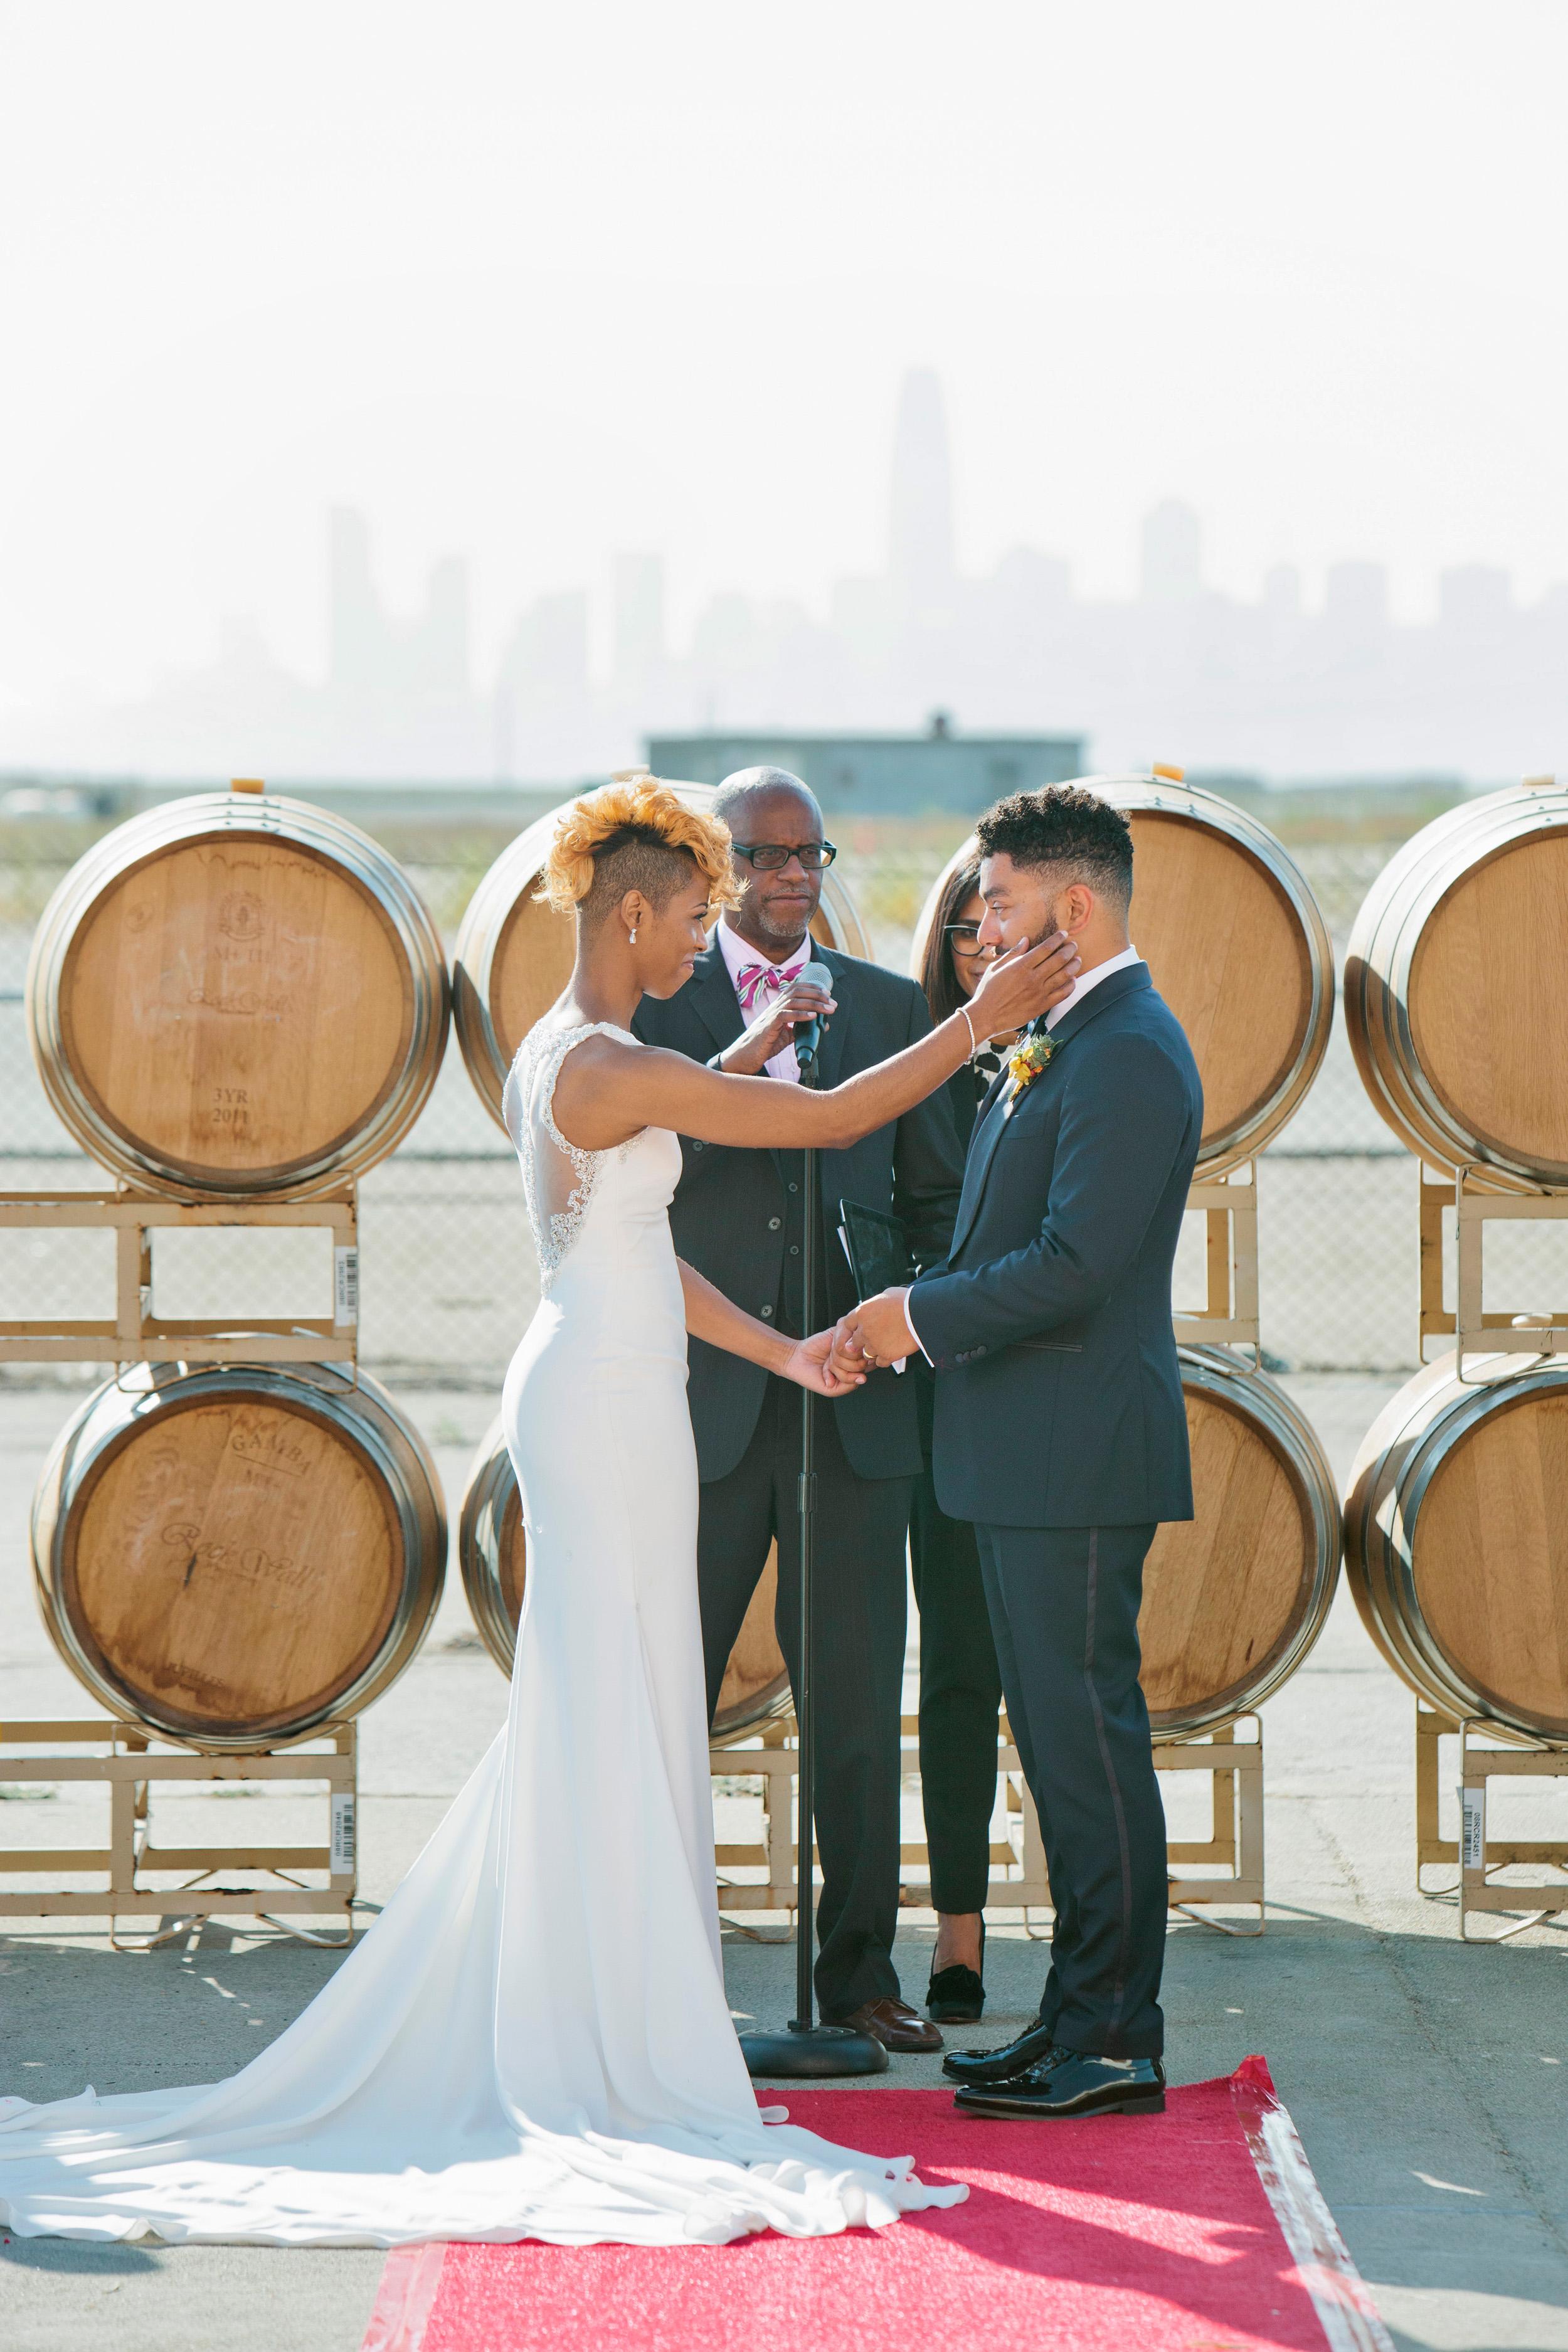 Alameda-Rockwall-Winery-Wedding-032.JPG